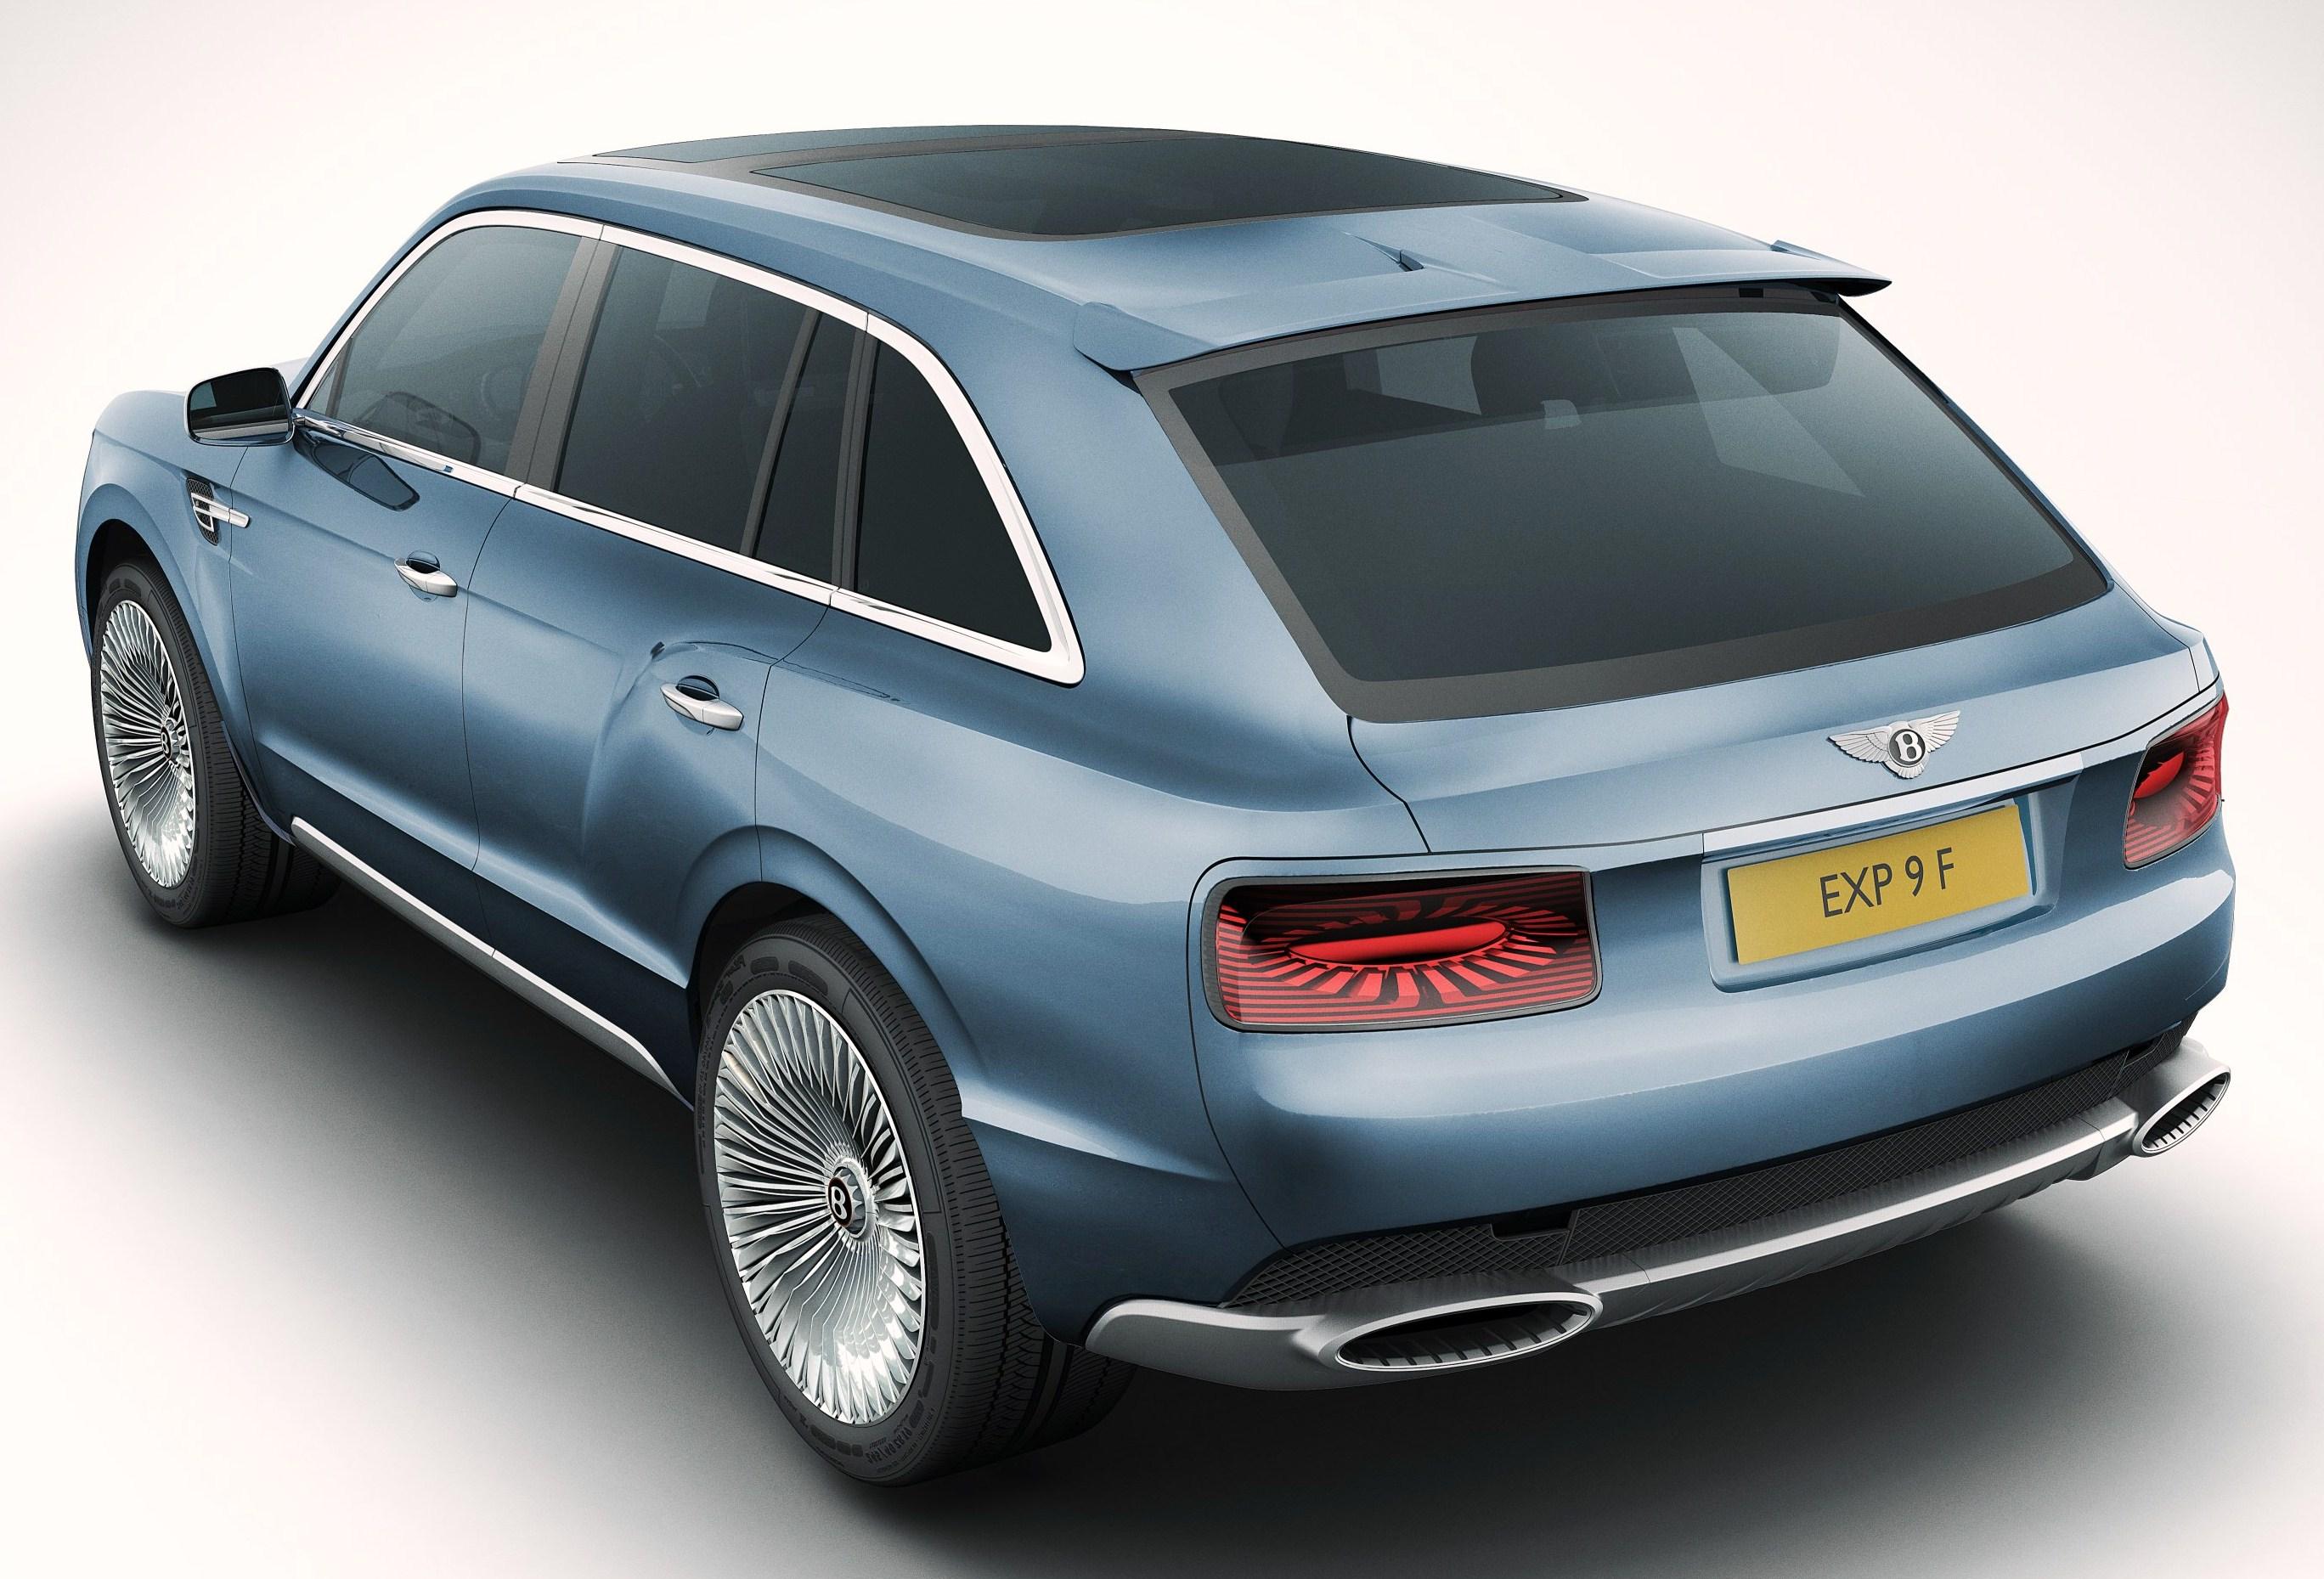 2014 Bentley Truck Bentley-suv-rear